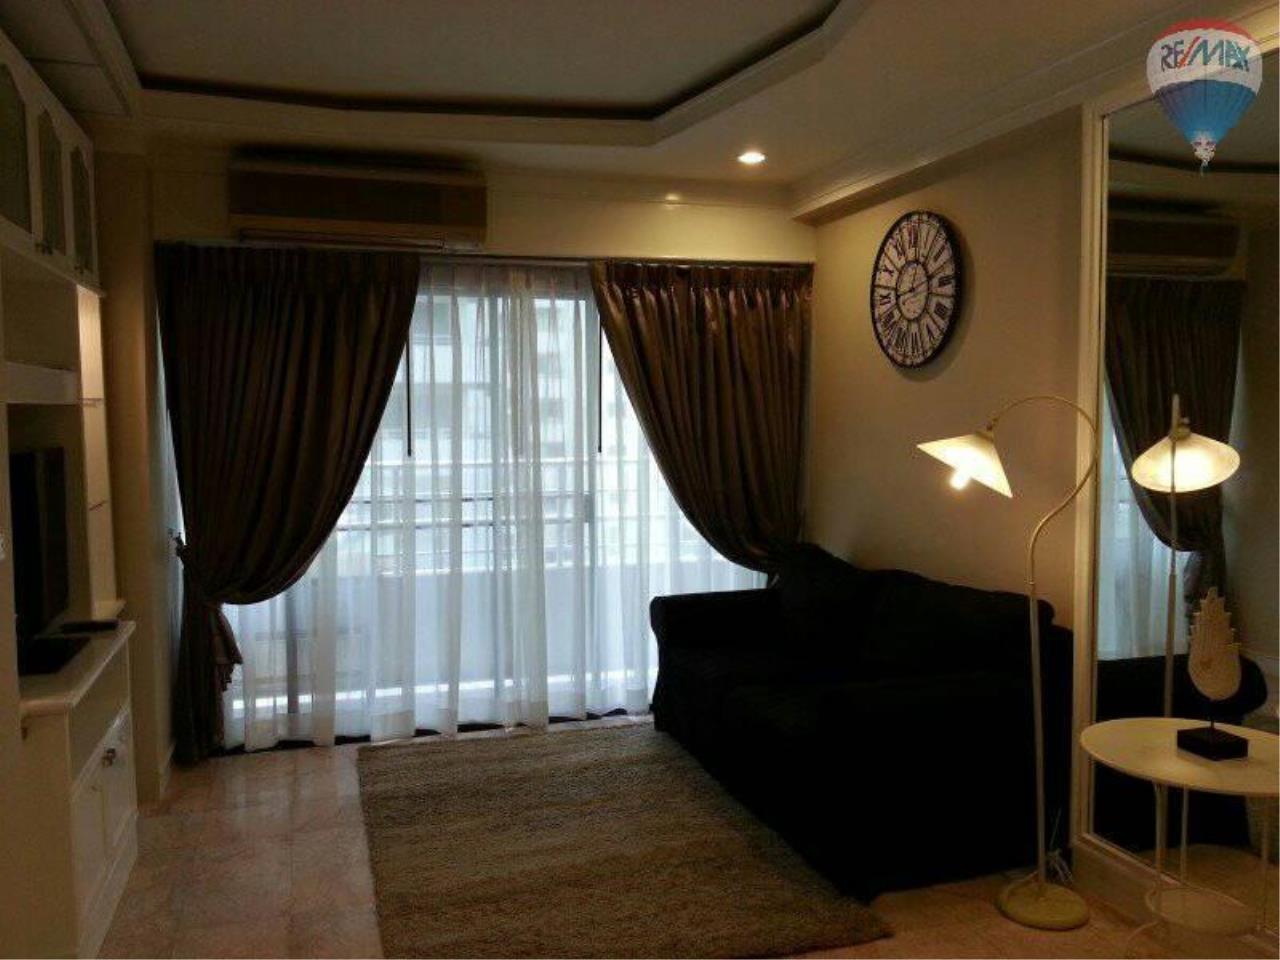 RE/MAX Properties Agency's 1 Bedroom 60 Sq.m for RENT at Saranjai Mansion,Sukhumvit Soi 4 (Nana) 1